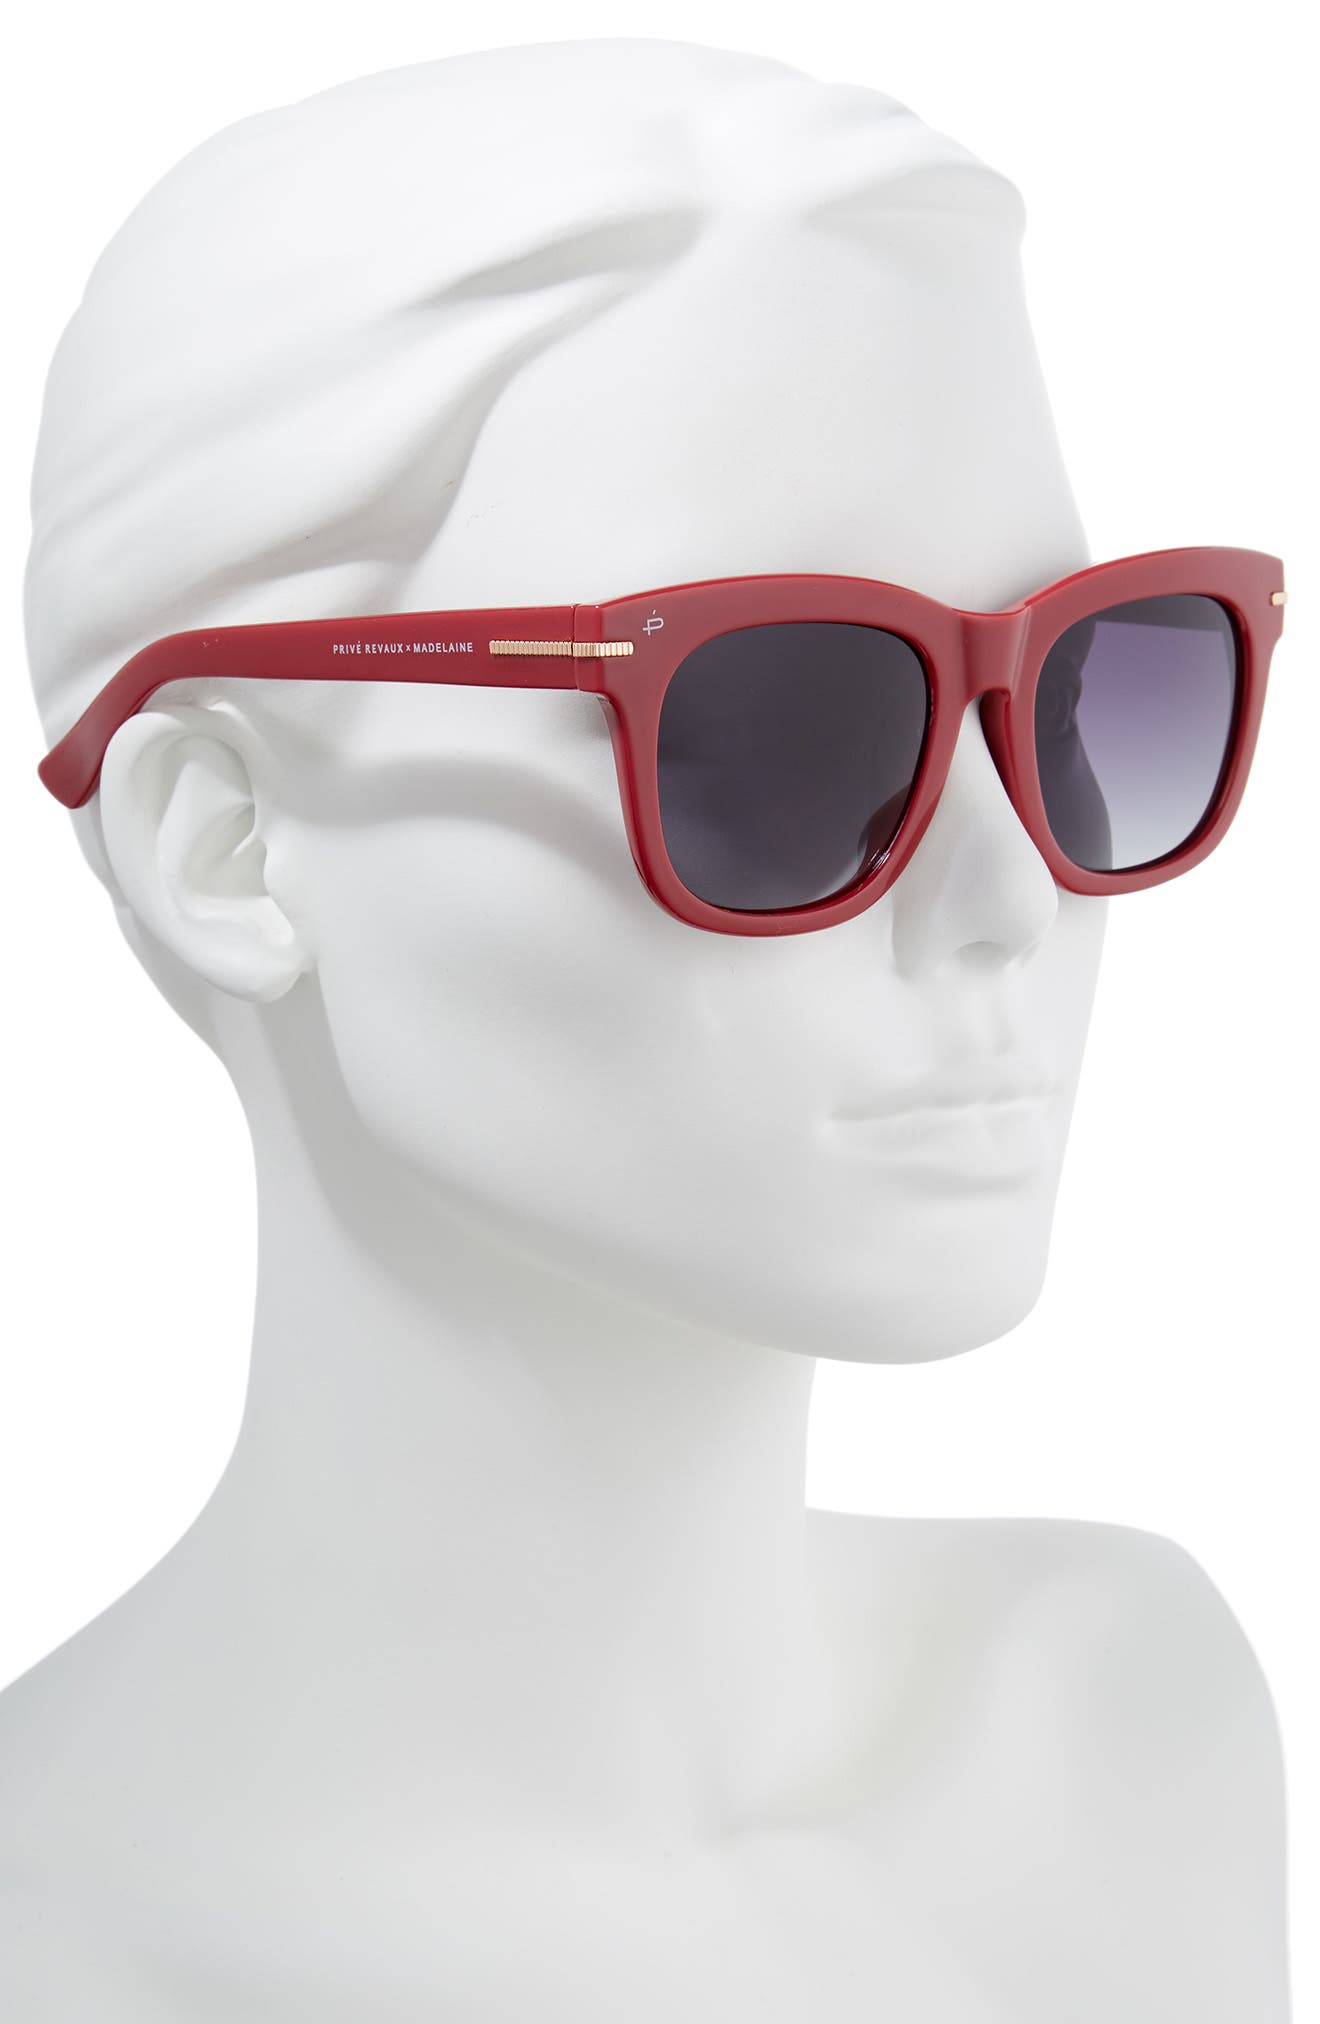 Privé Revaux x Madelaine Petsch The Clique 52mm Square Sunglasses,                             Alternate thumbnail 2, color,                             RED